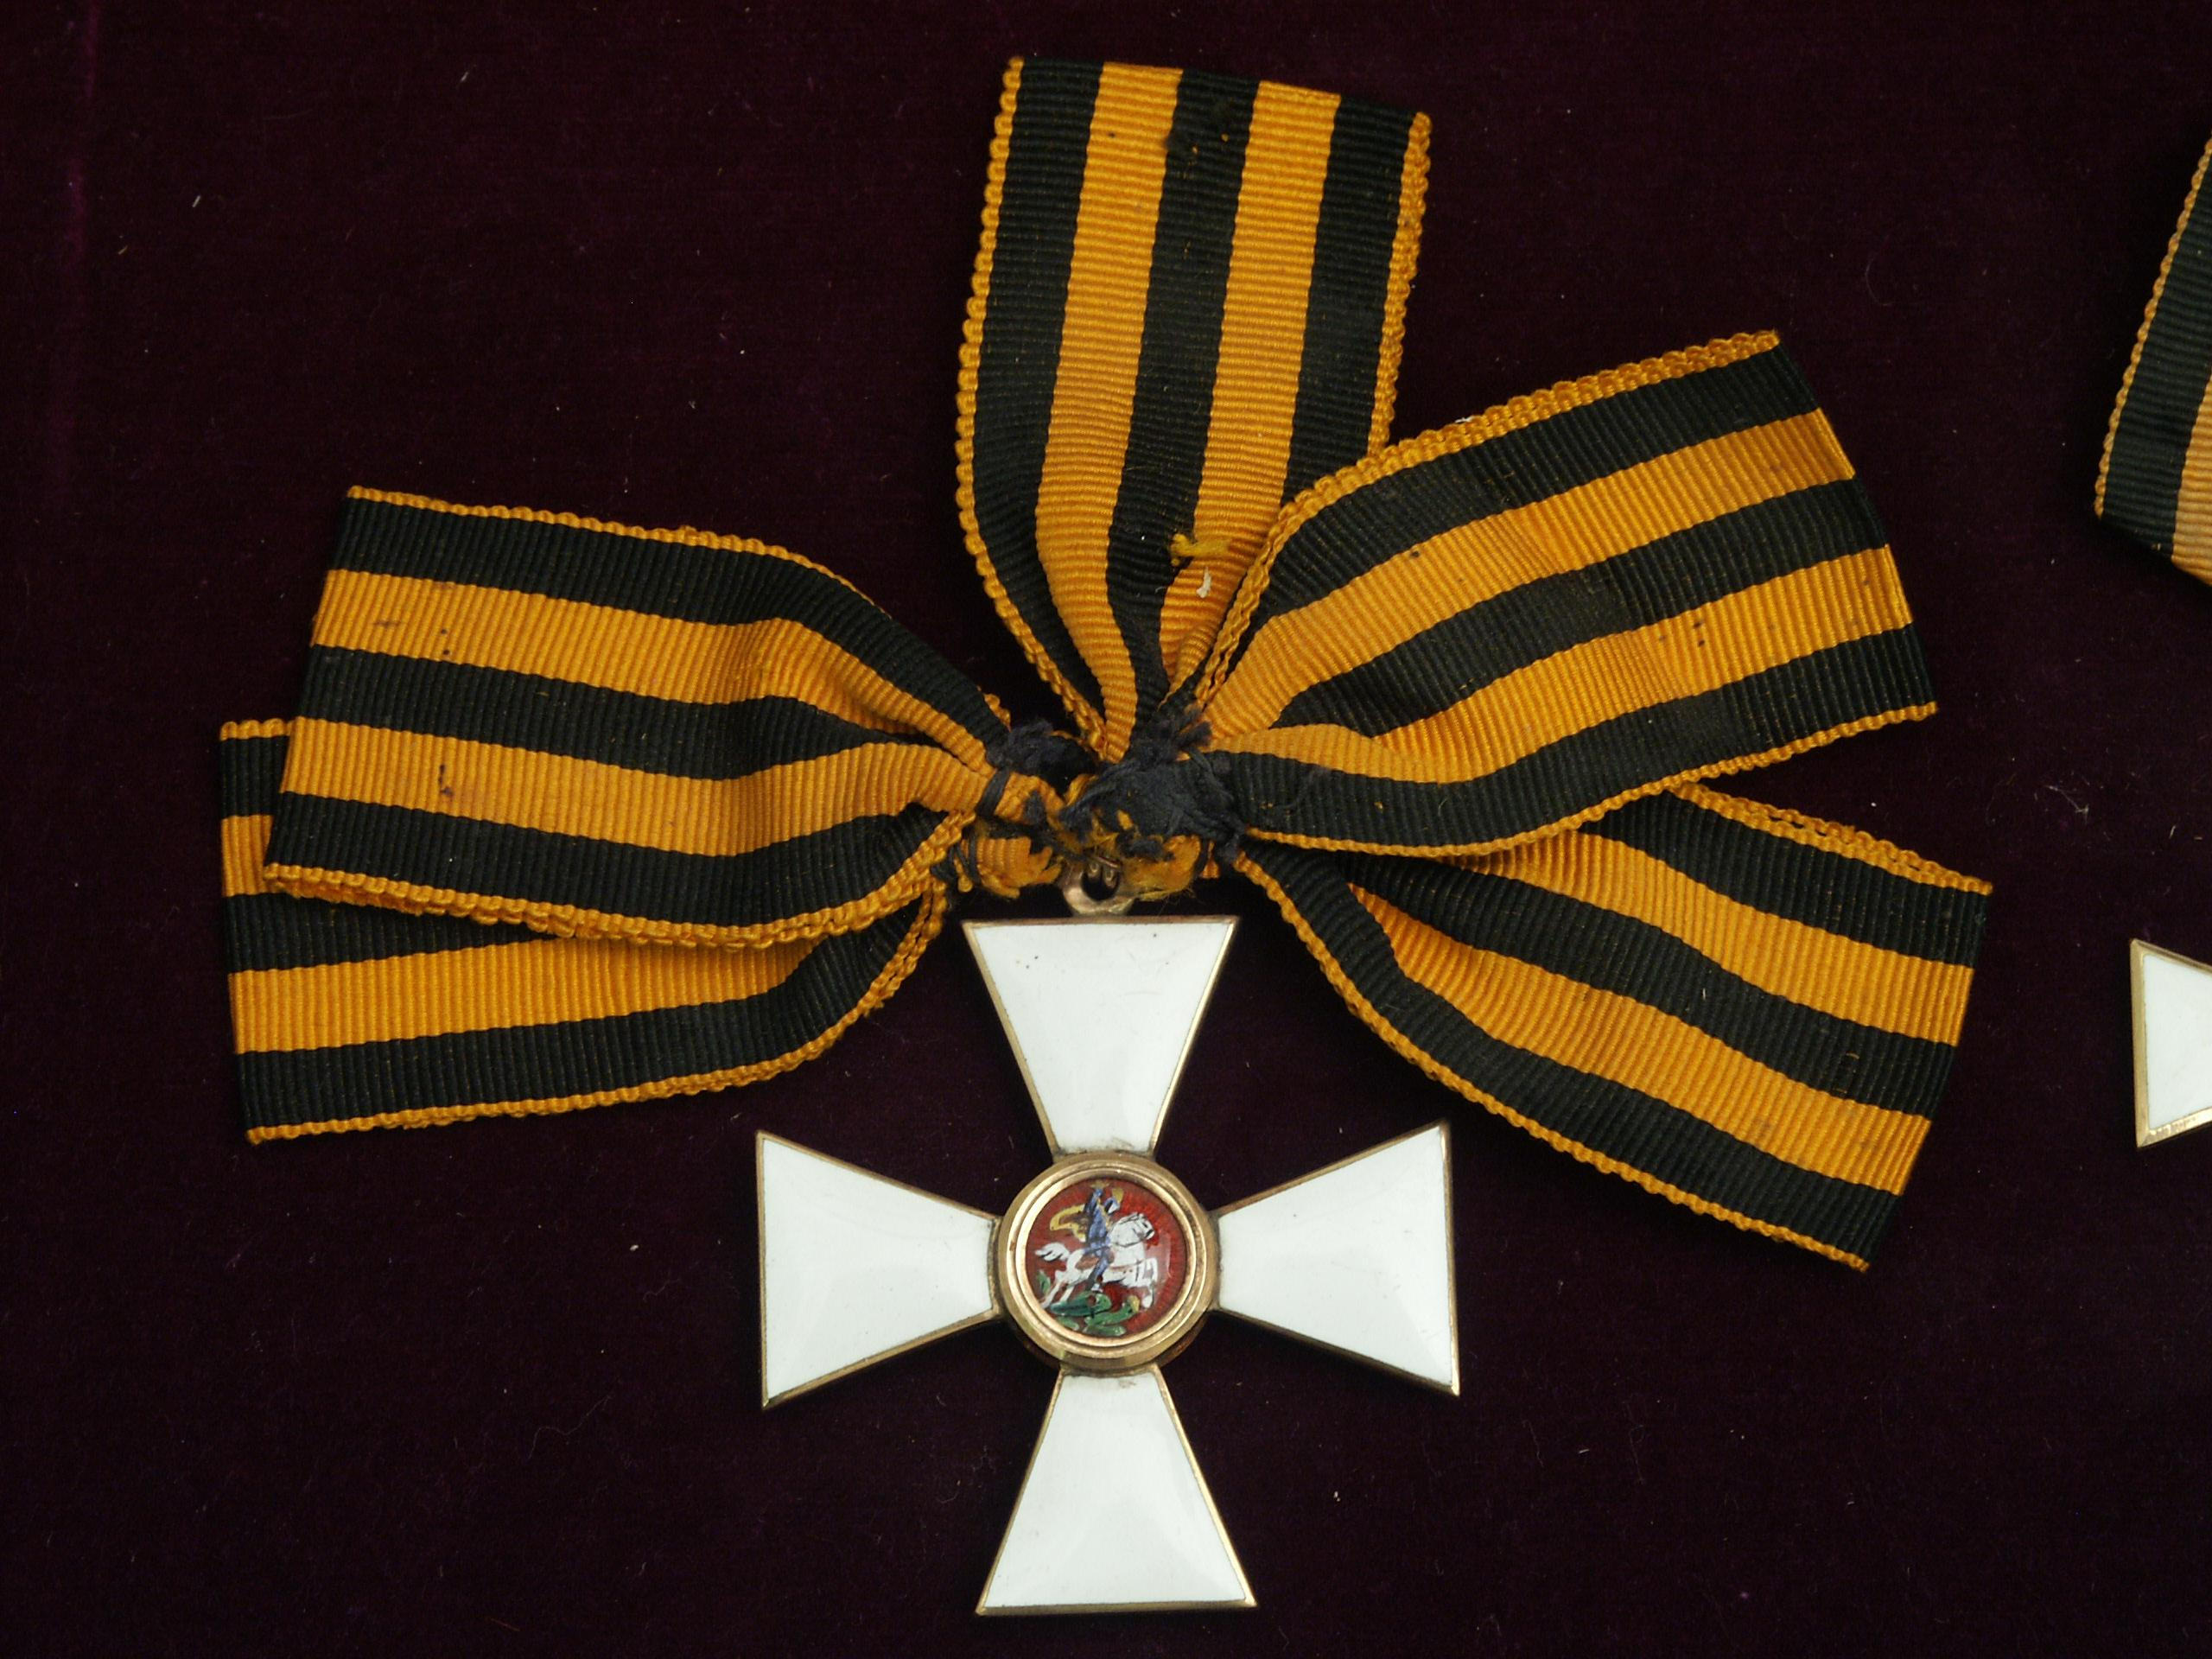 Знак ордена Св. Георгия III ст.